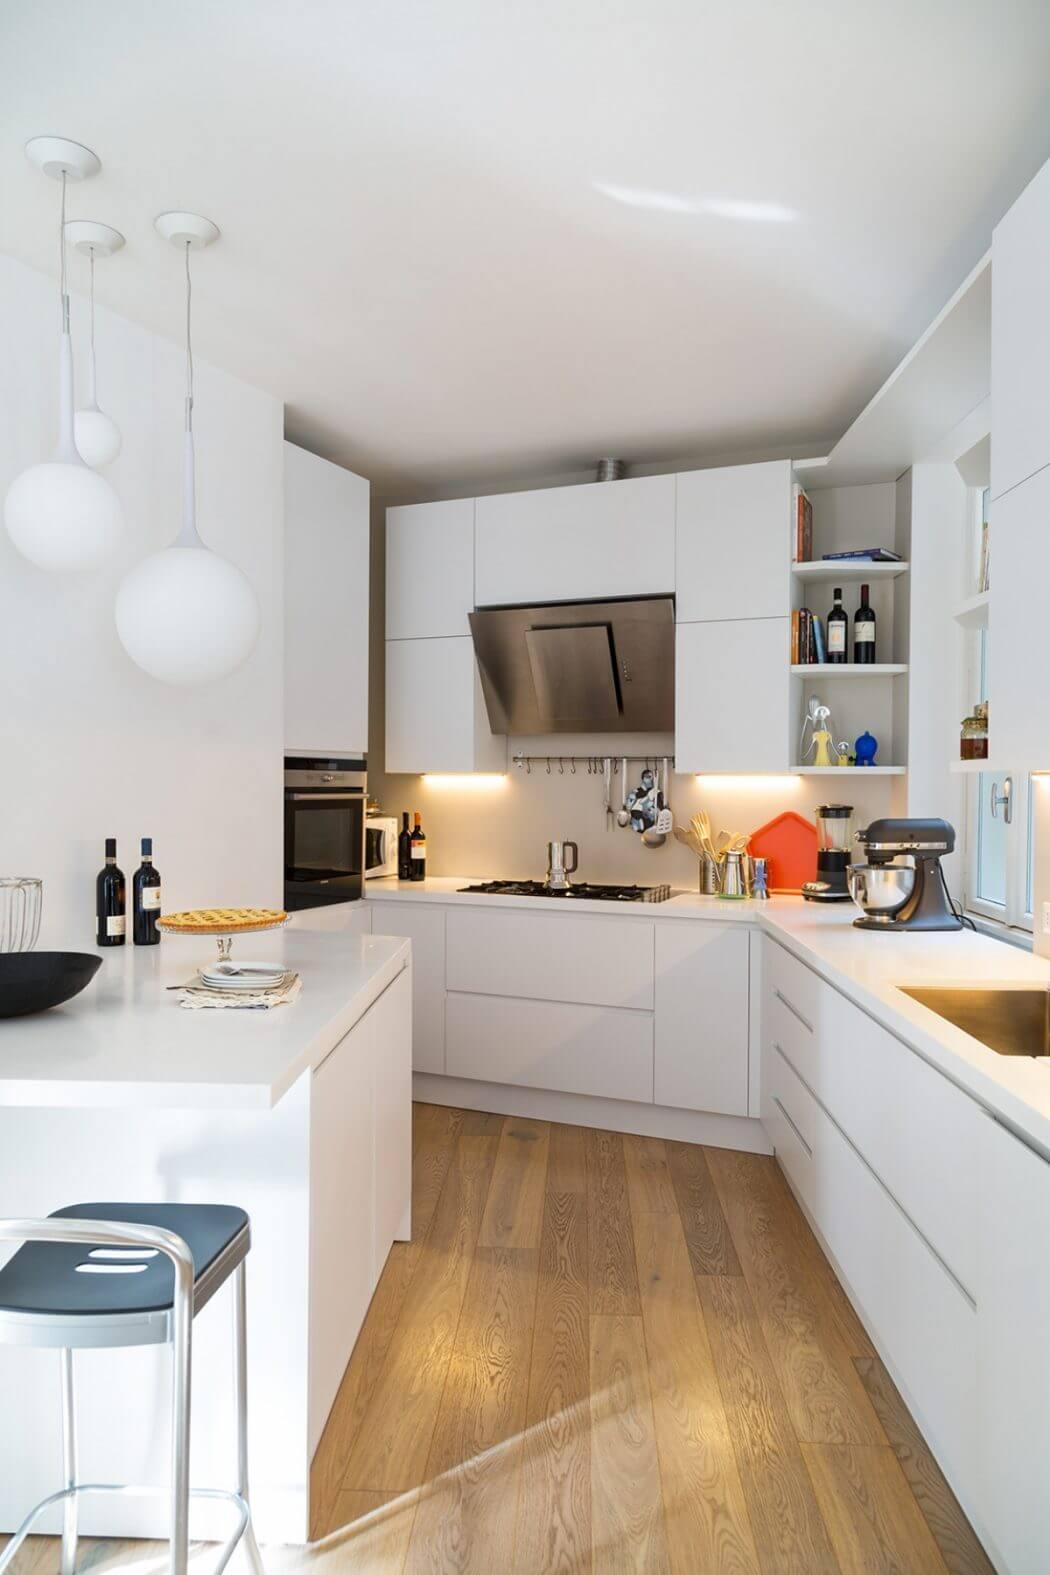 La casa studio by teresa paratore homeadore for Progetto cucina online gratis